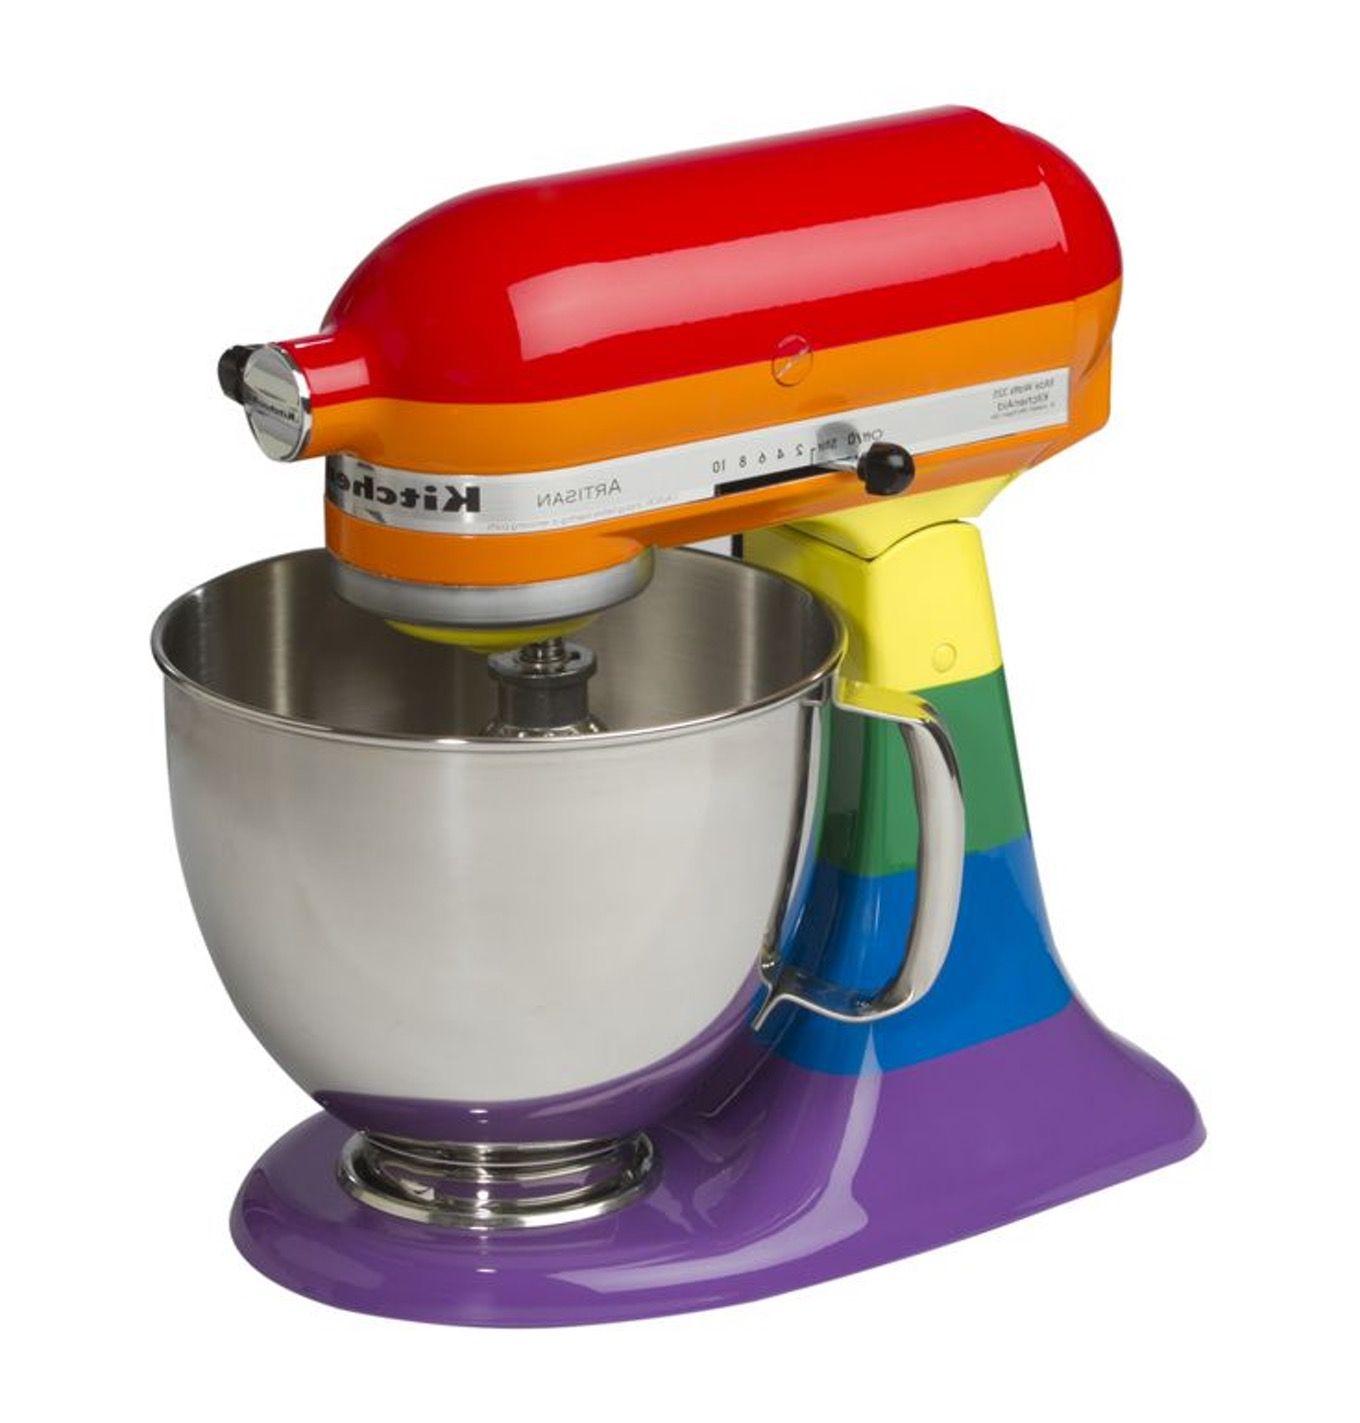 walmart catalogue kitchen single to appliances may canada